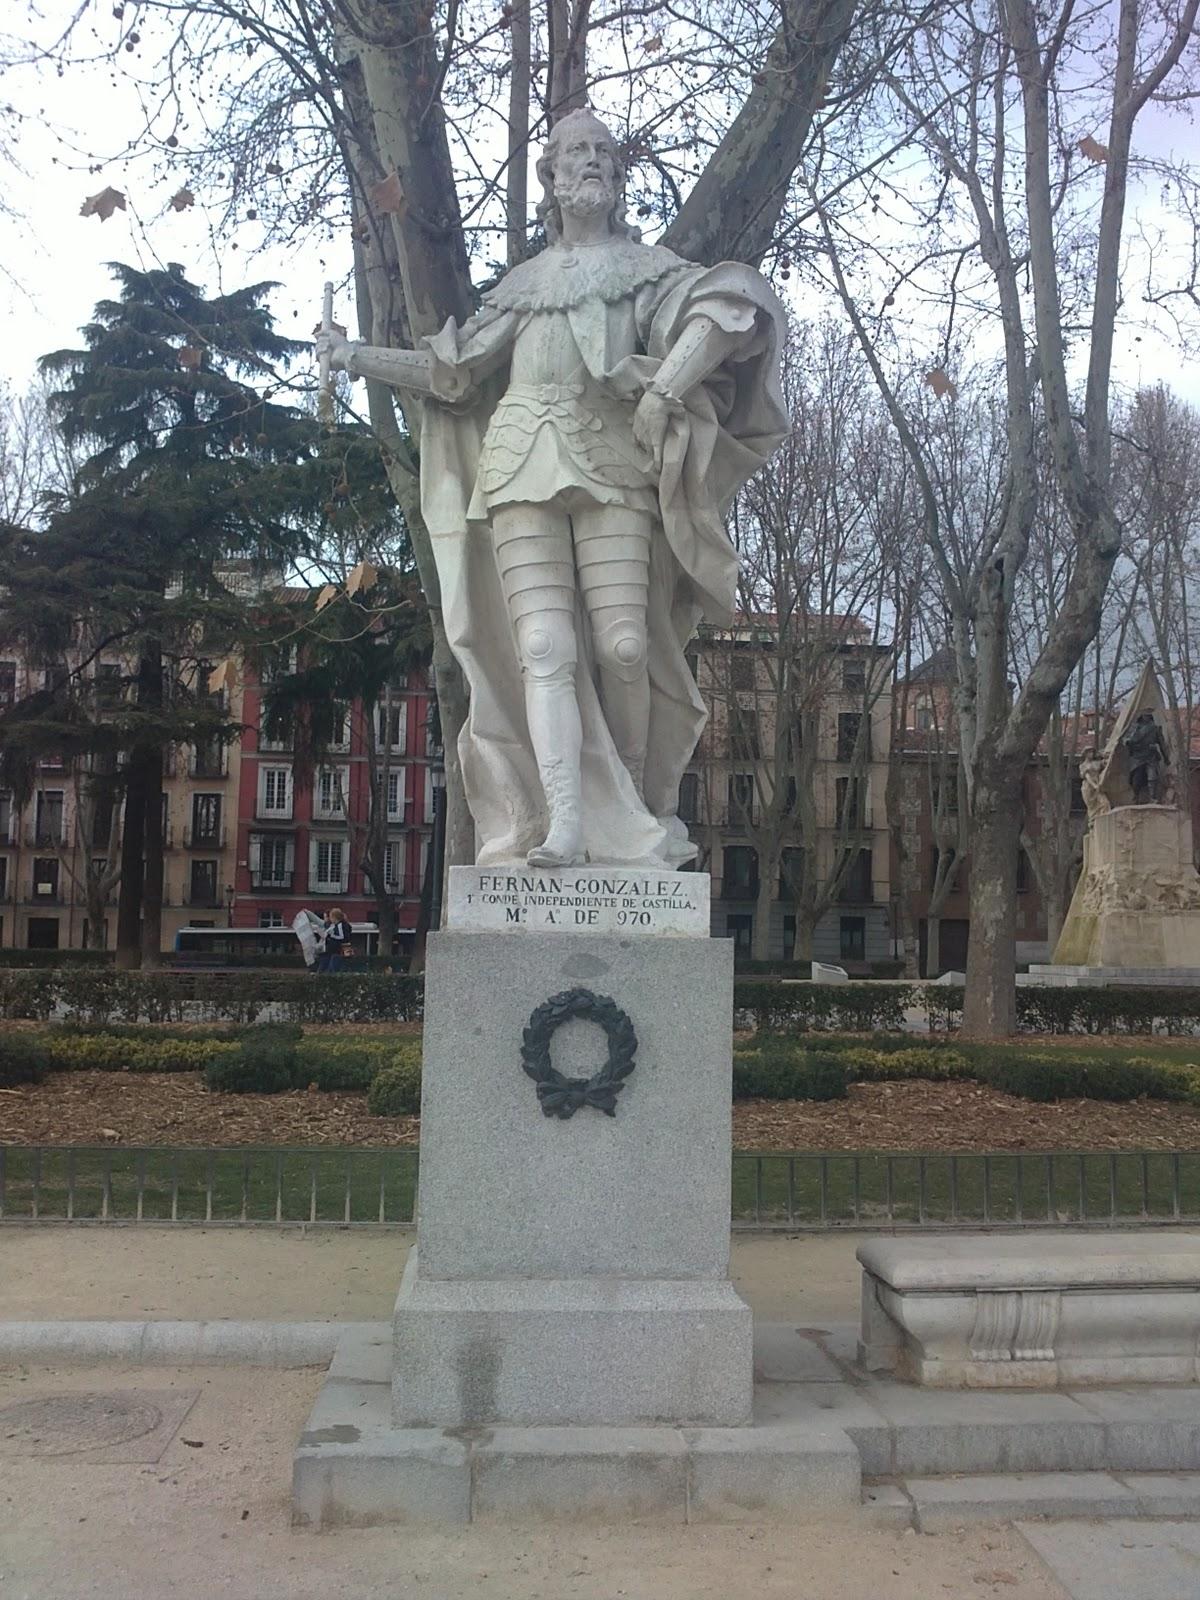 Europa de lisboa a vladivostok el jard n de las estatuas - Estatuas de jardin ...